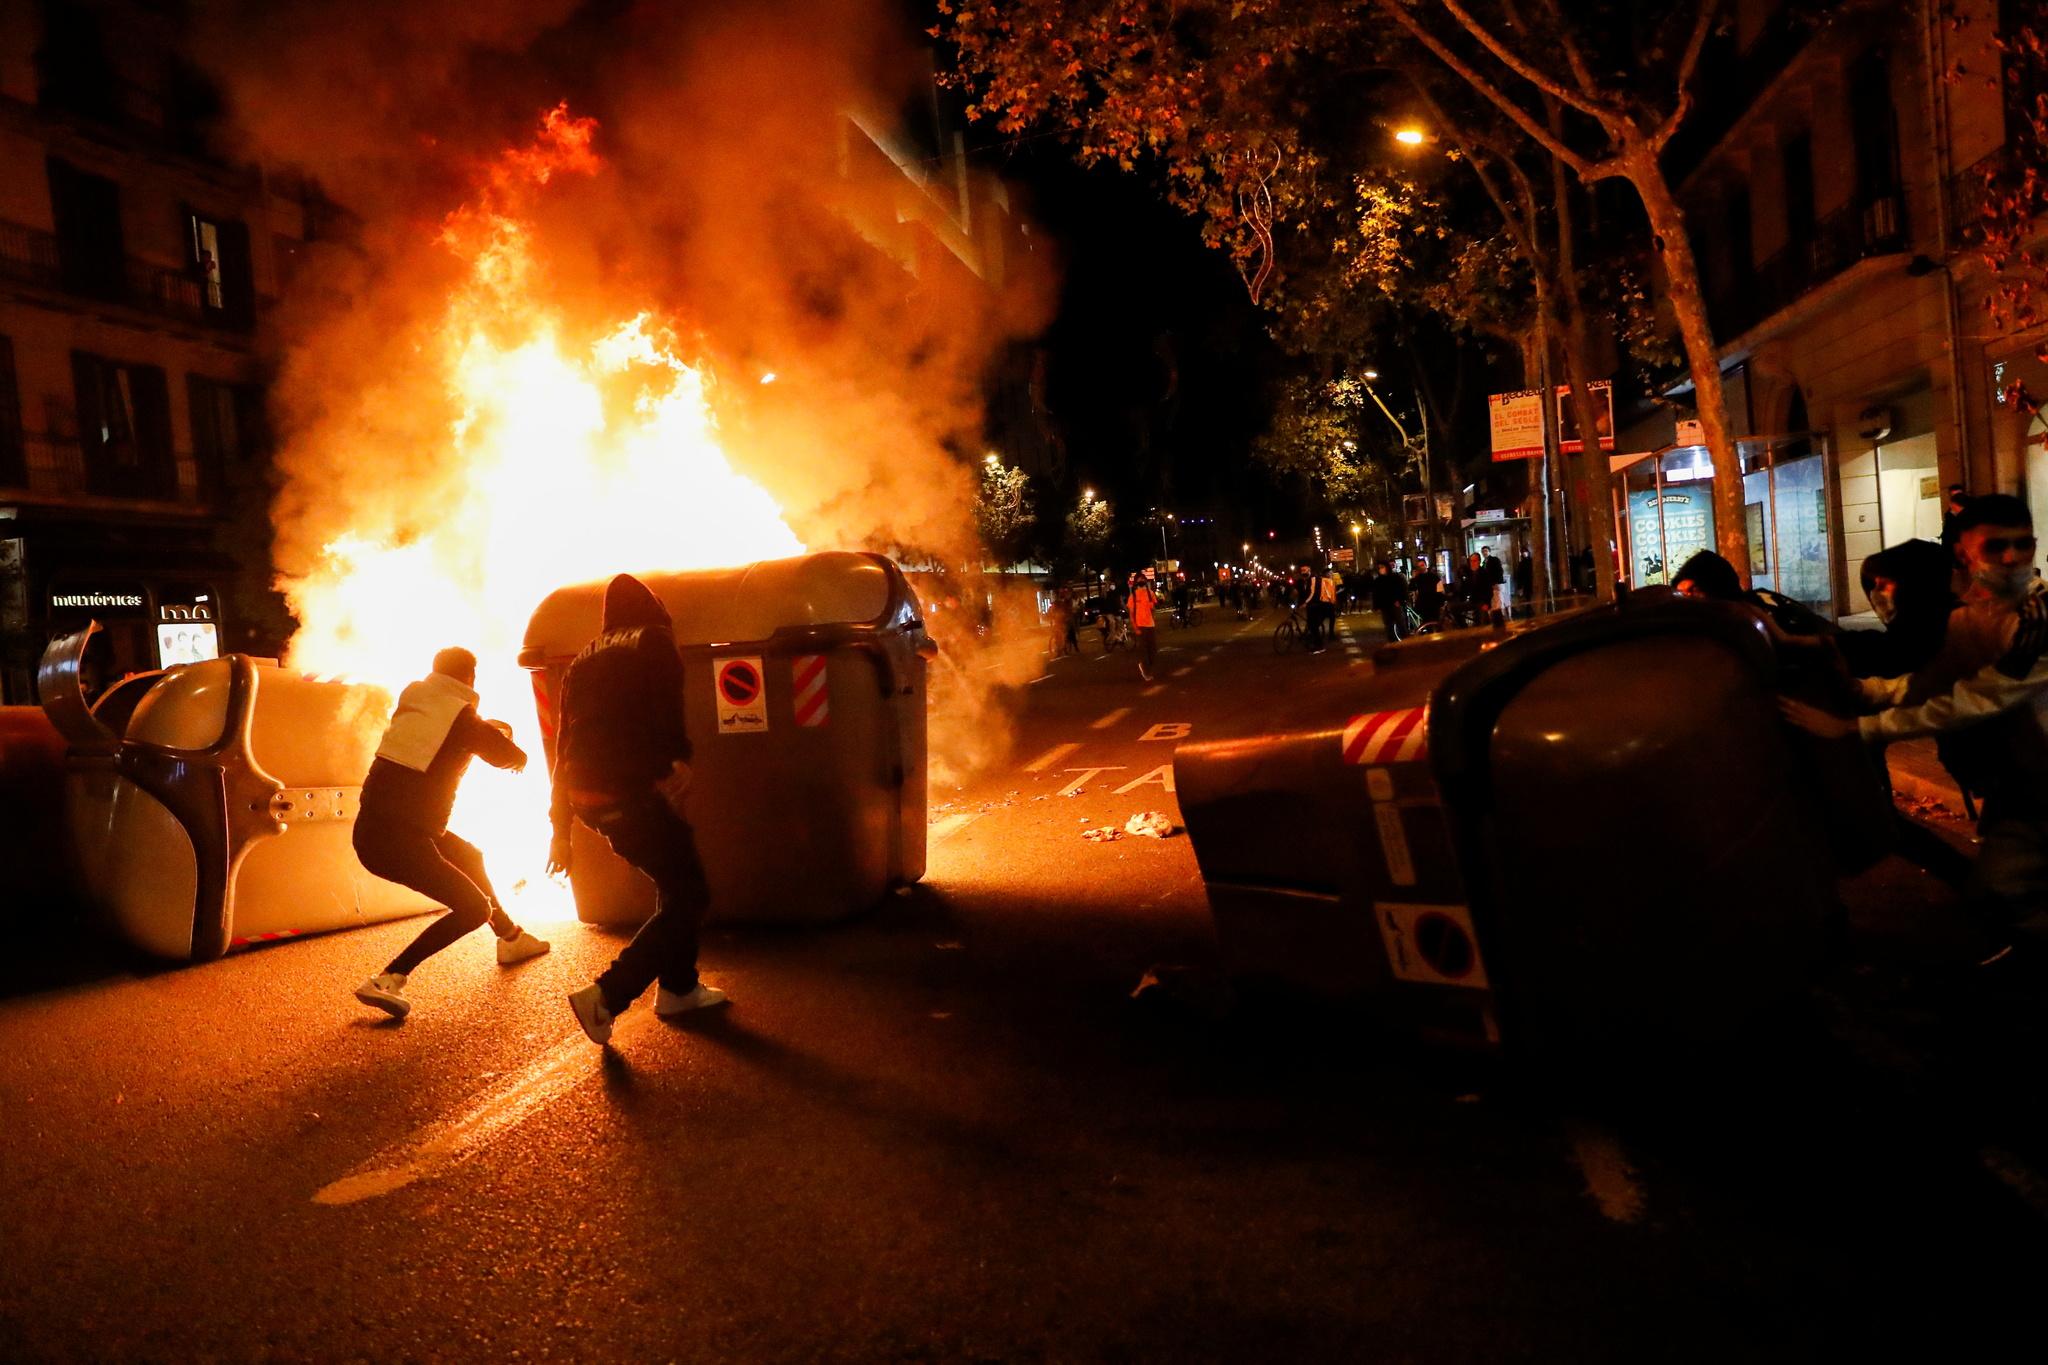 Algunos manifestantes han quemado y usado contenedores a modo de barricada.